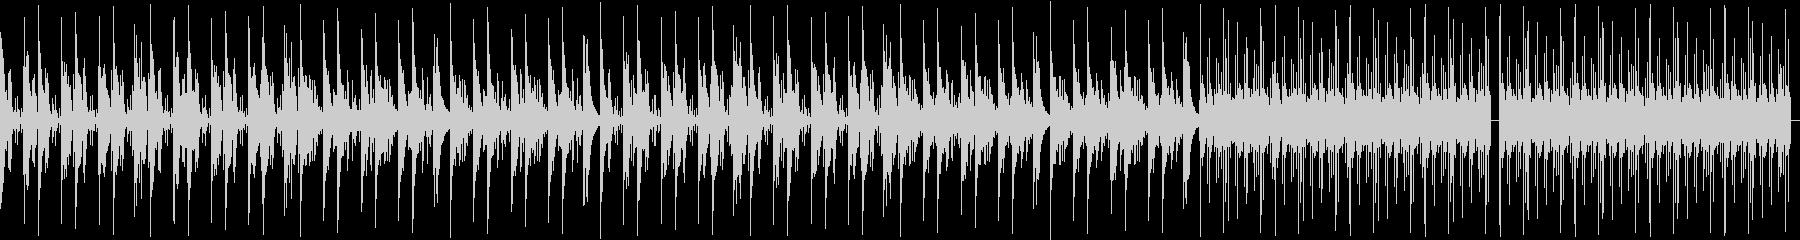 148bpm、Ab-min、不思議な感じの未再生の波形